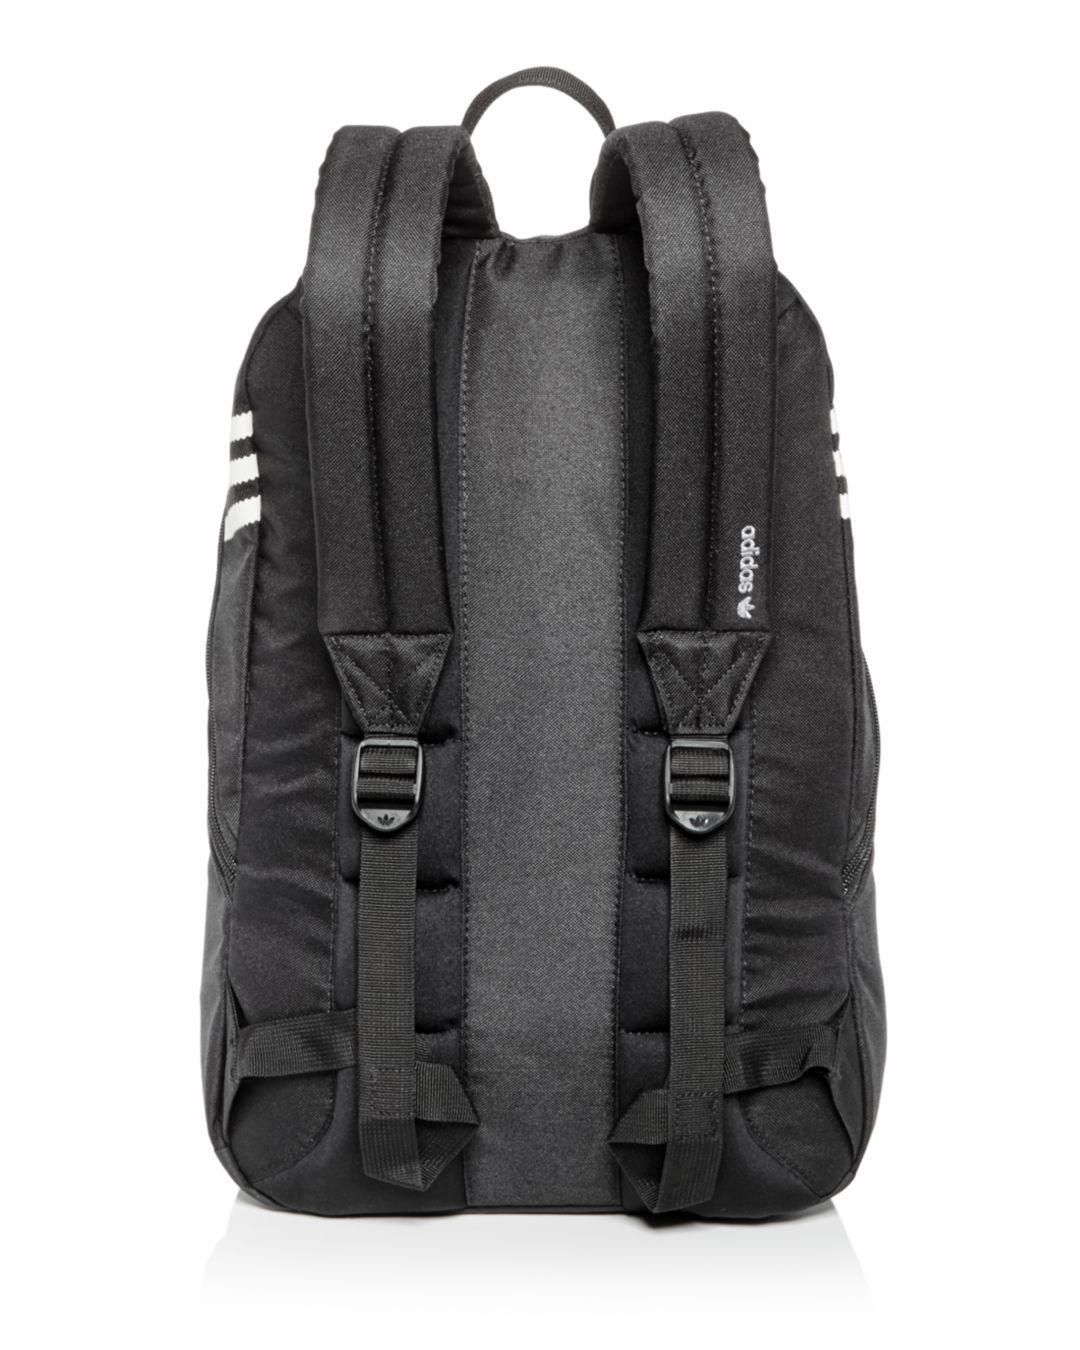 d064f0c911 Lyst - adidas Originals National Backpack in Black for Men